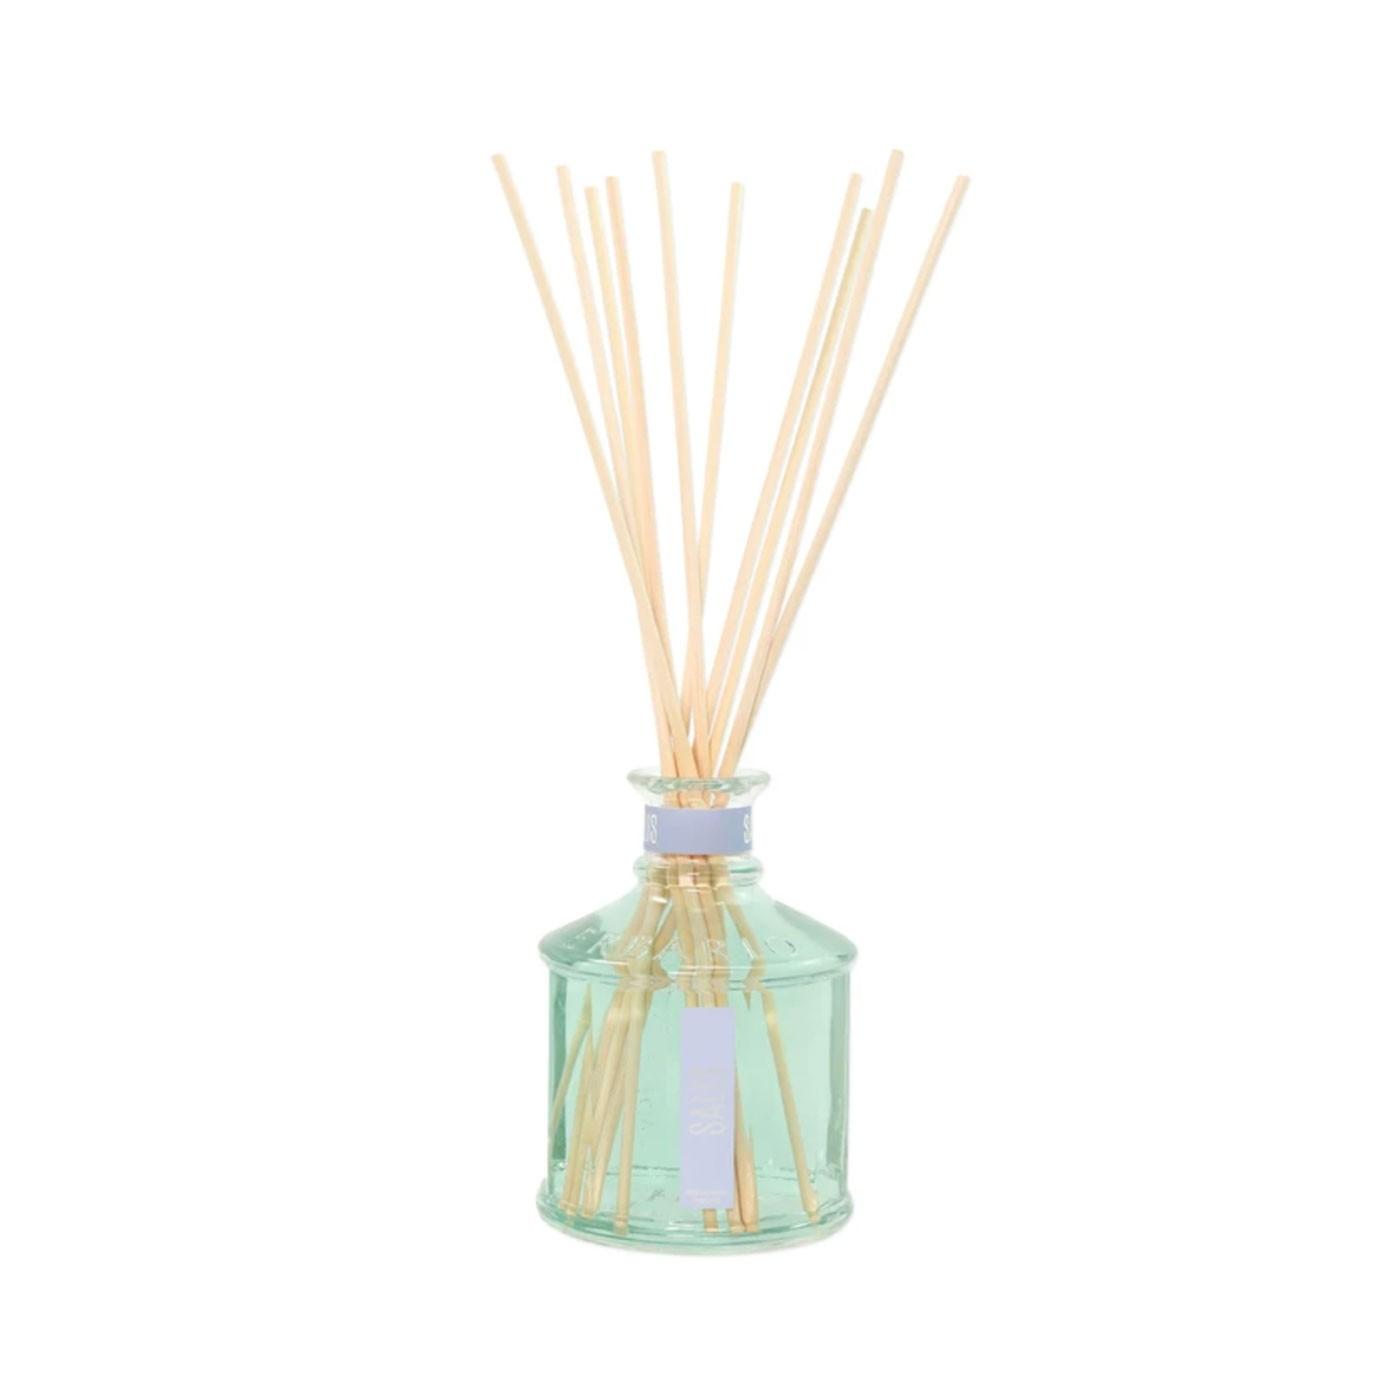 Salis Fragrance Diffuser 8.4 oz - Erbario Toscano | Eataly.com